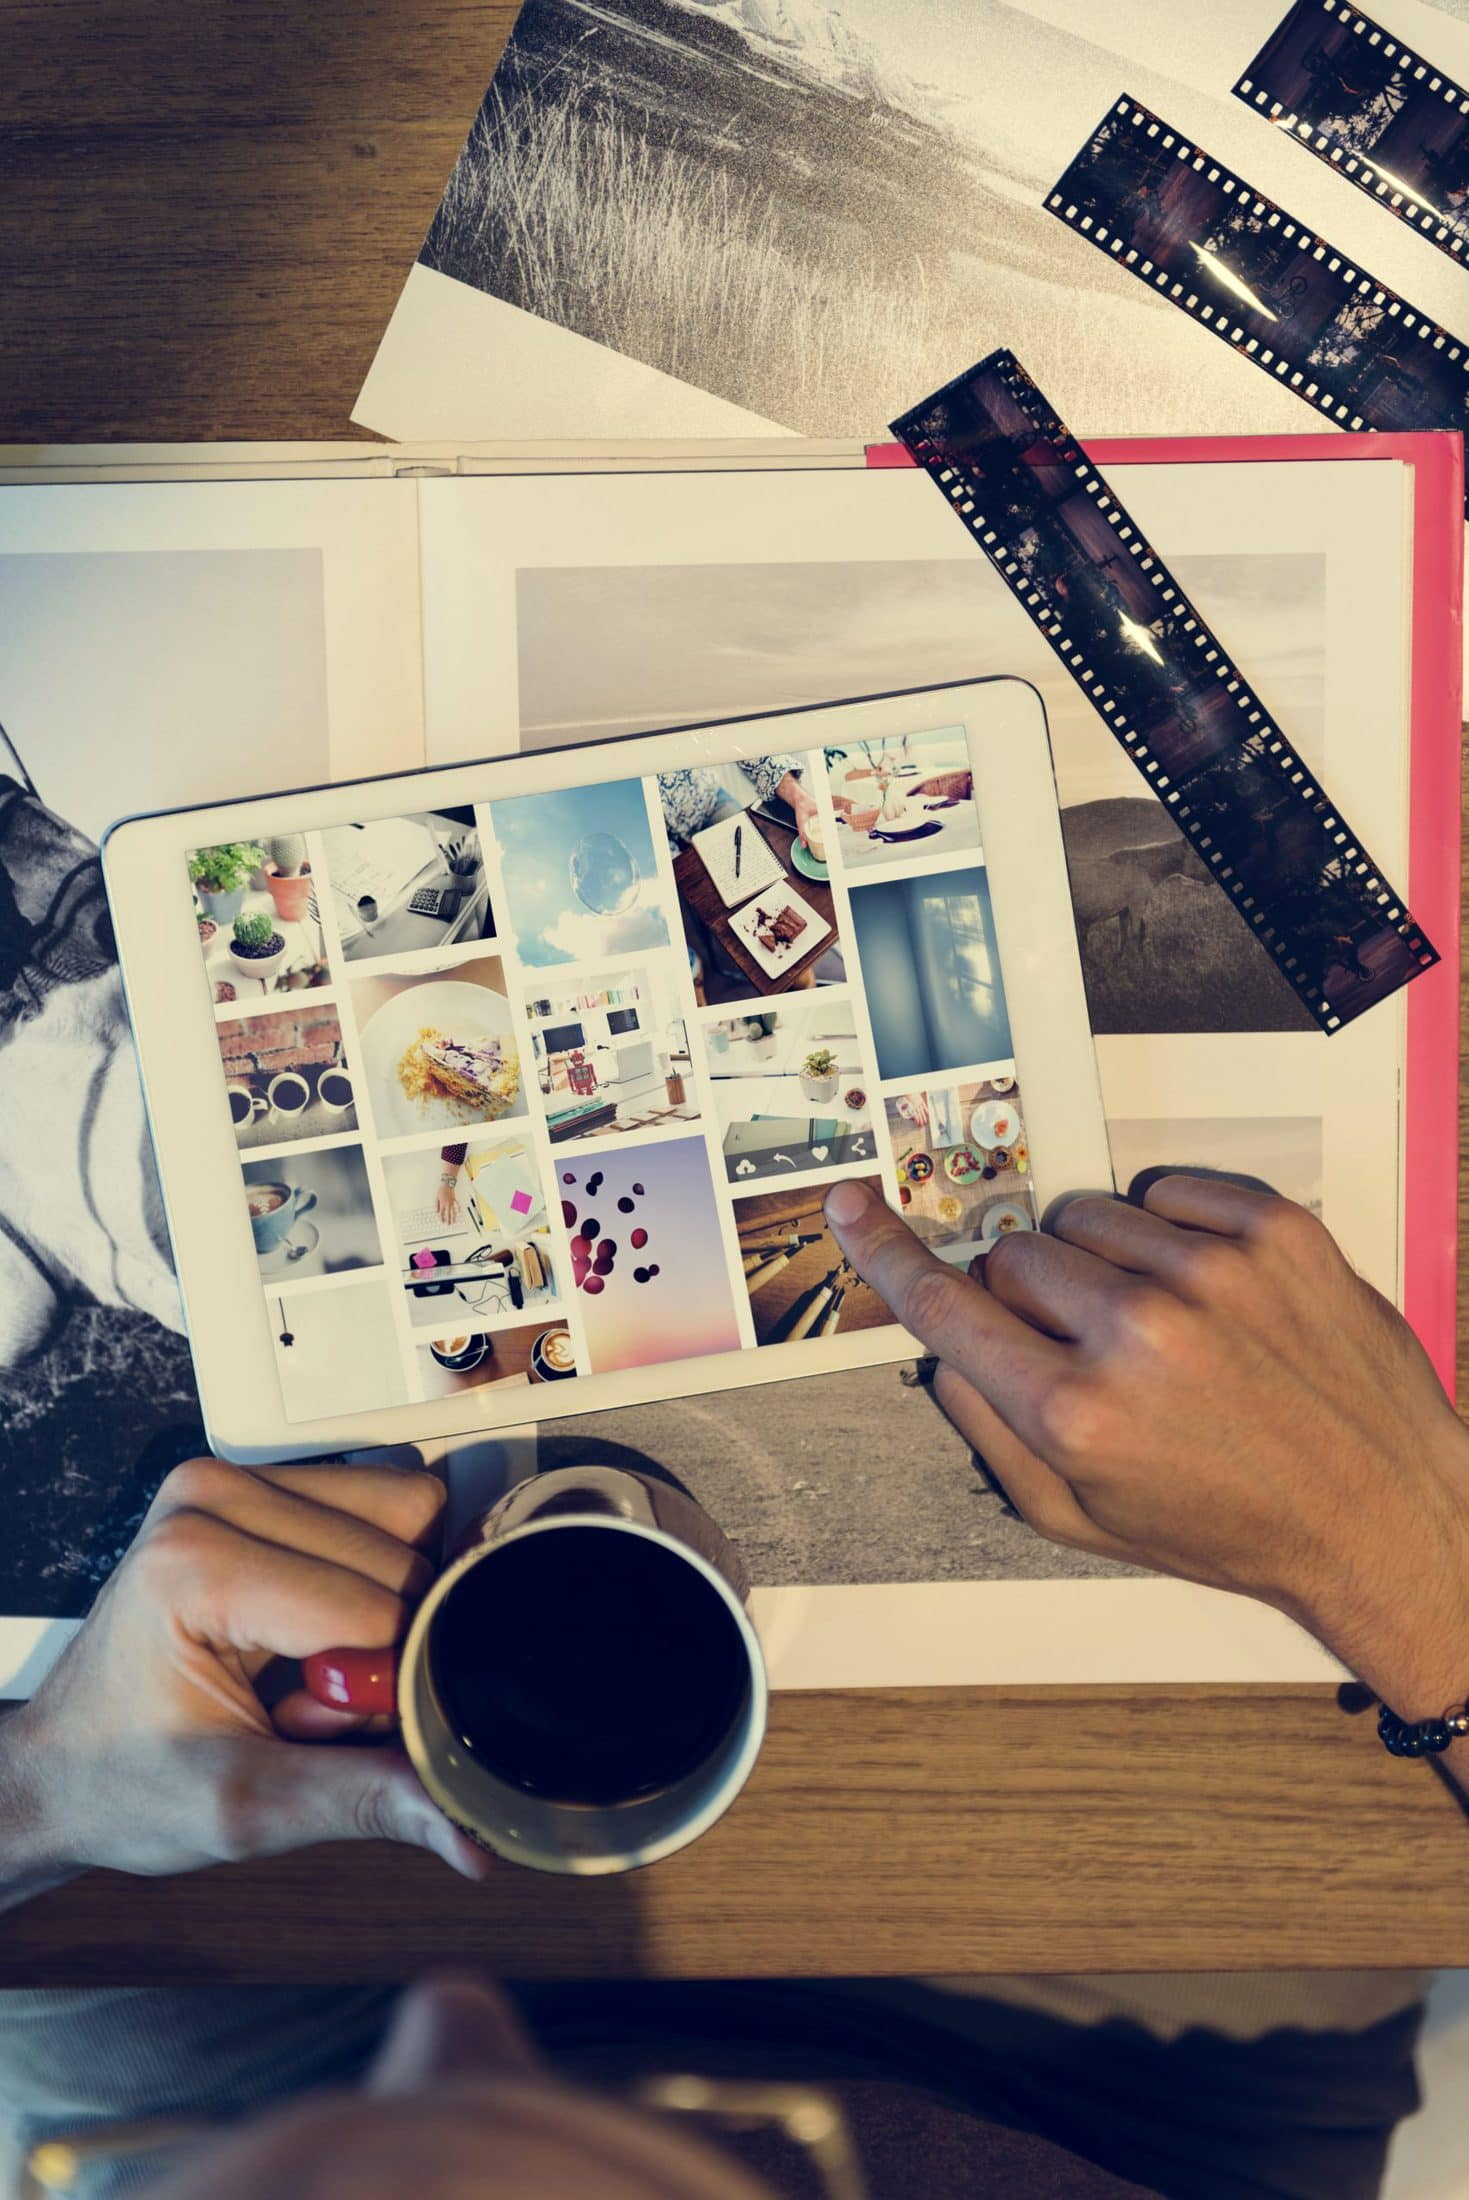 photography ideas creative occupation design studi 2021 04 02 19 51 39 utc scaled